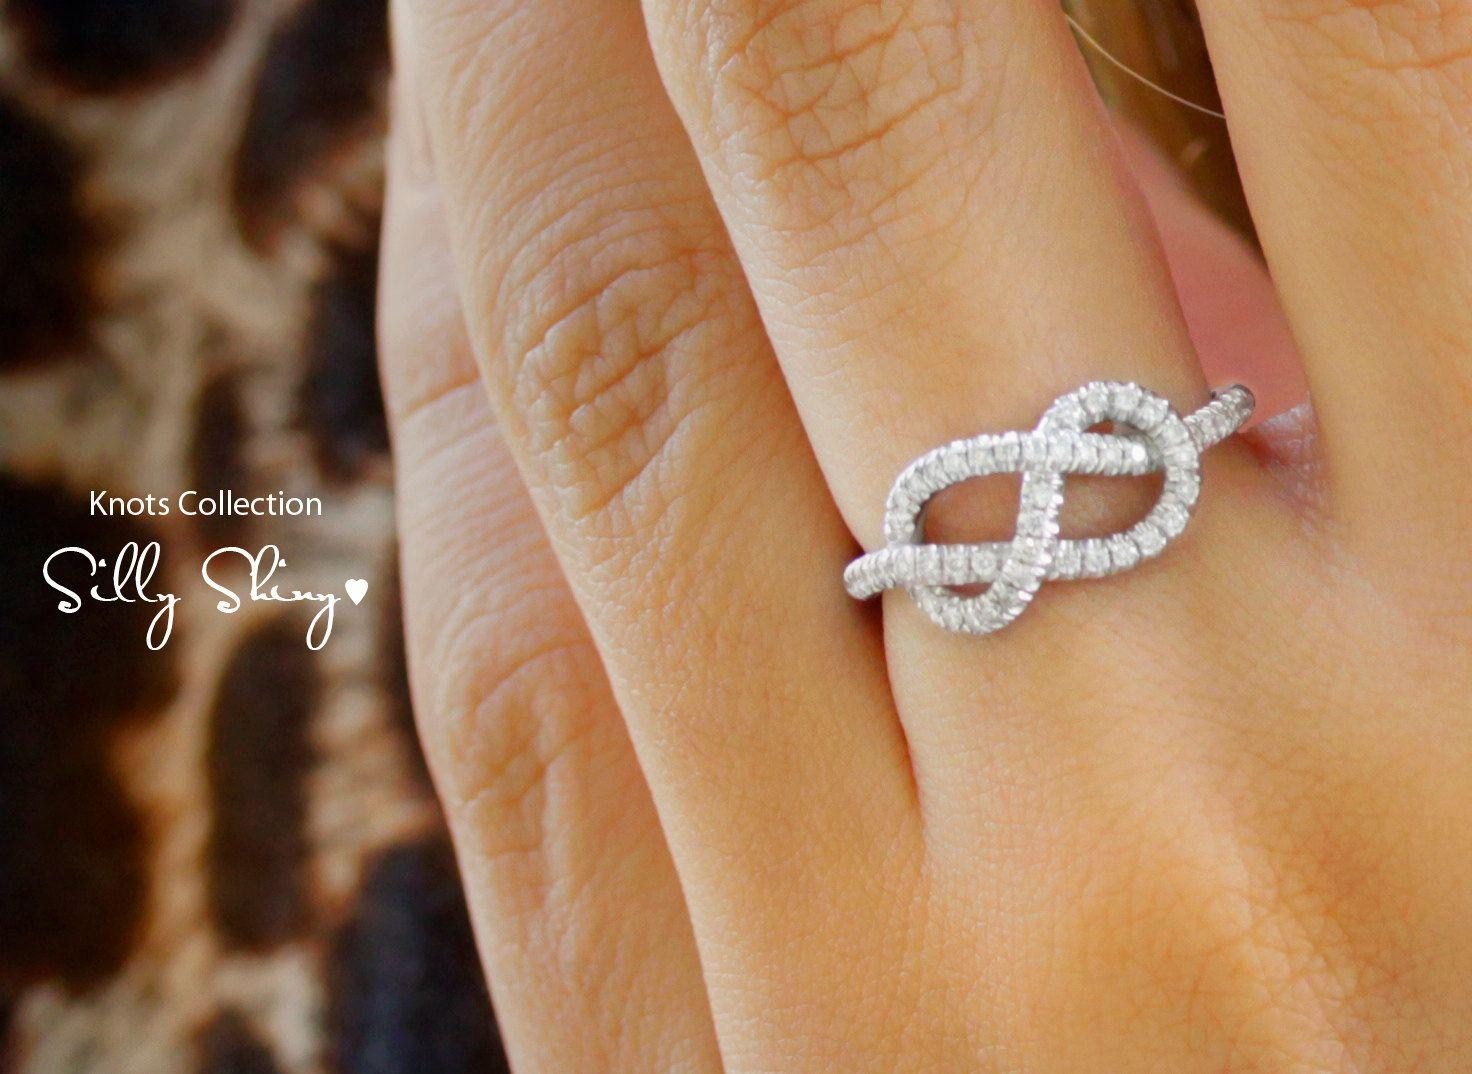 Infinity ring. Love!!